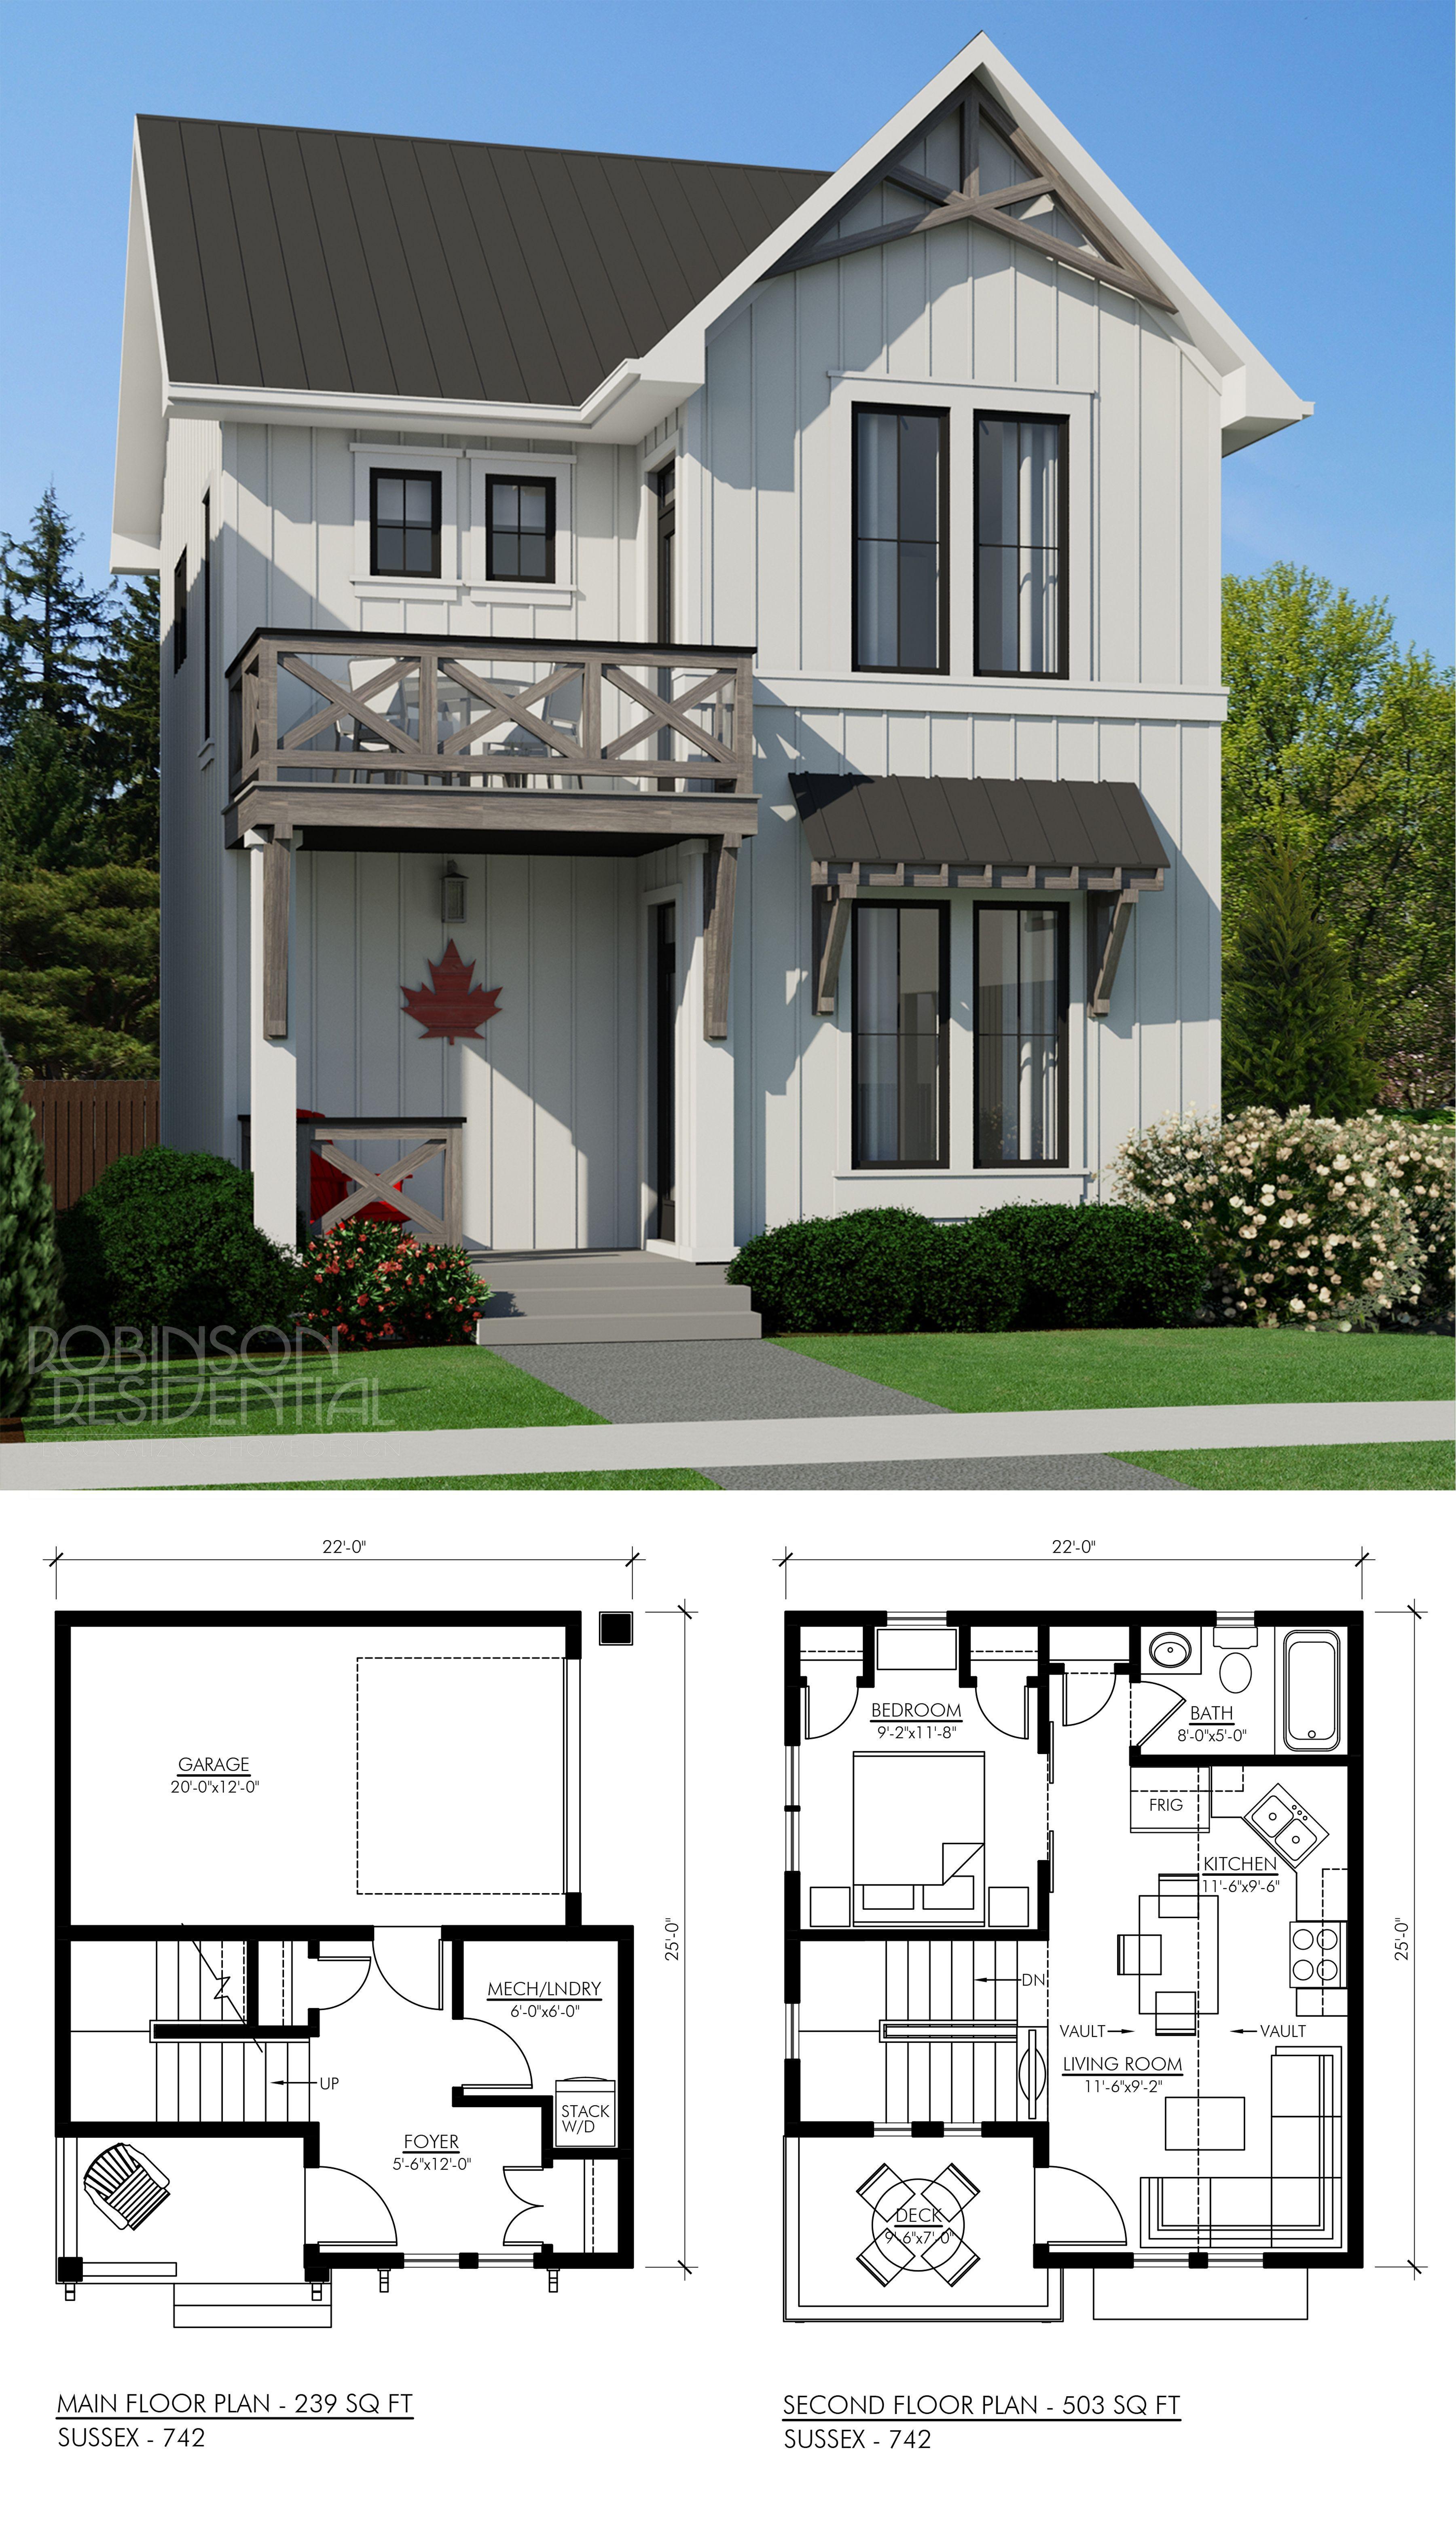 Modernes Bauernhaus Sussex 742 Garage In 2020 Small House Plans House Plans Modern Farmhouse